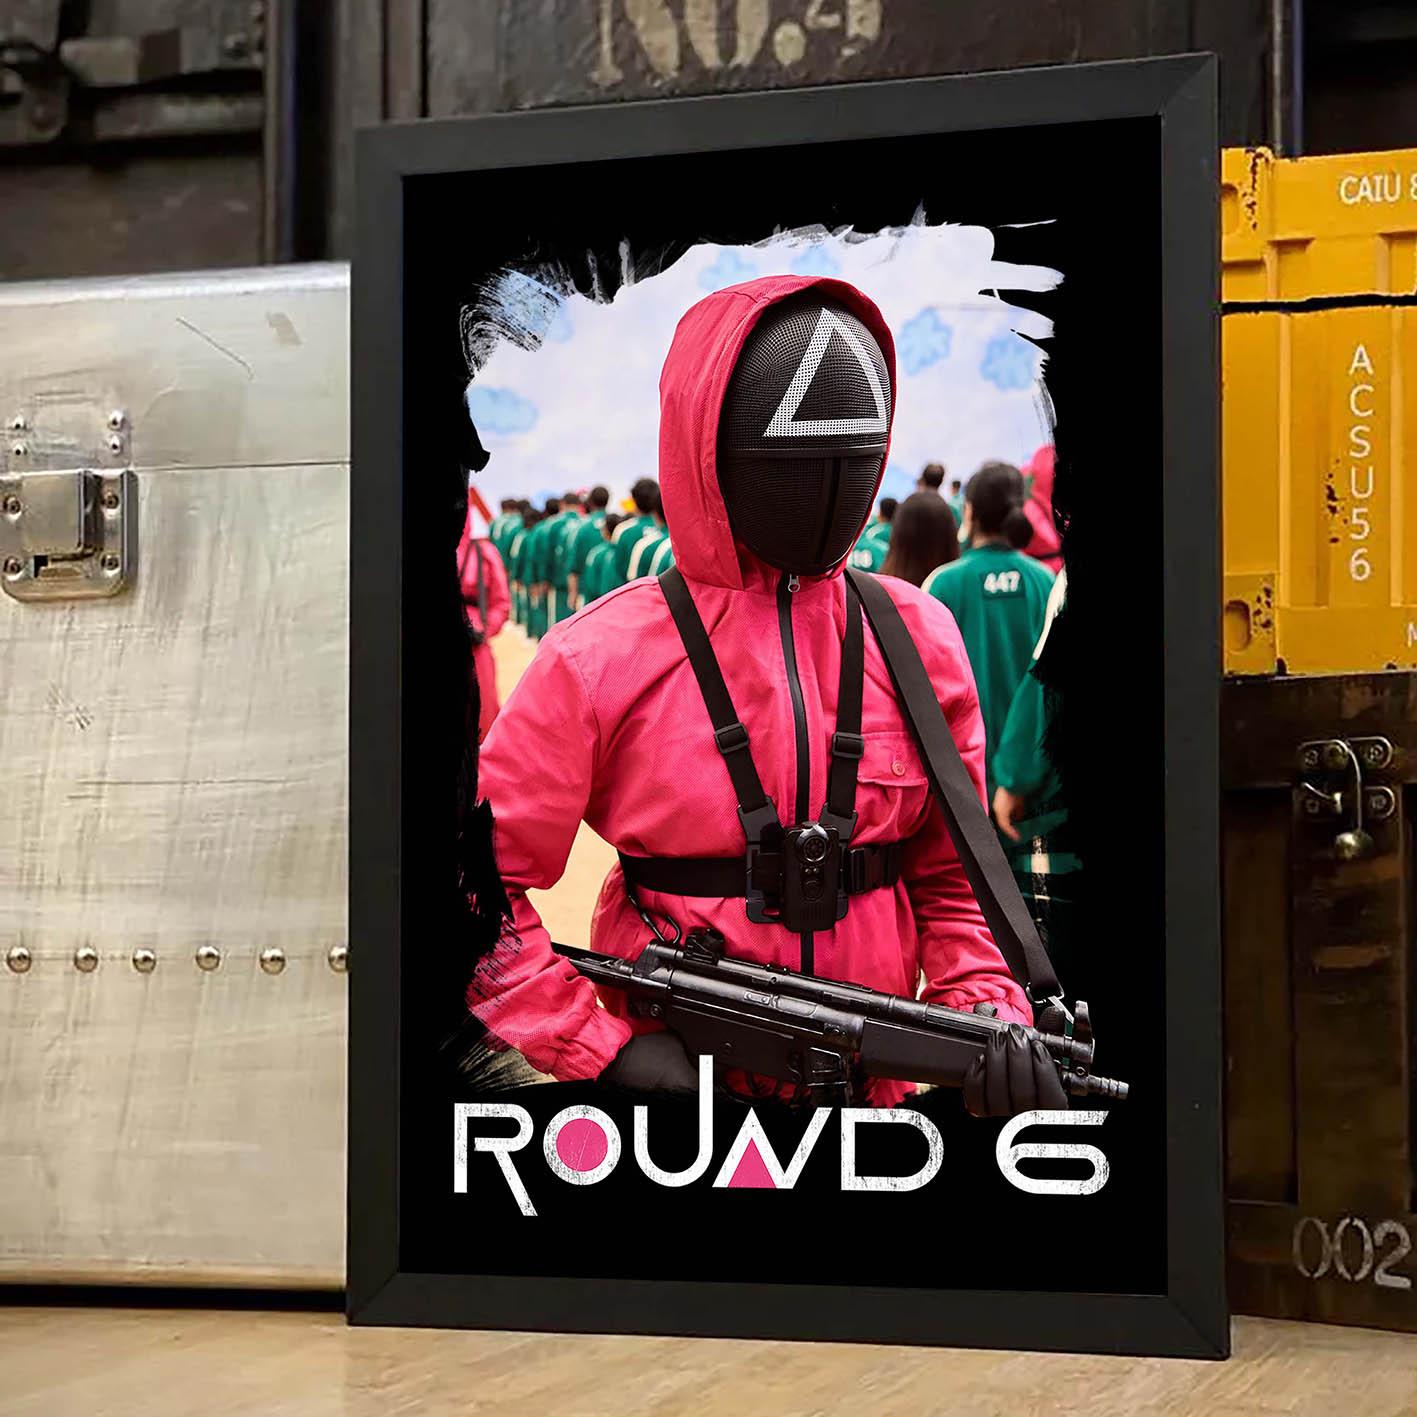 Quadro Com Moldura Round 6 Squid Game Netflix - 46x33 - EV